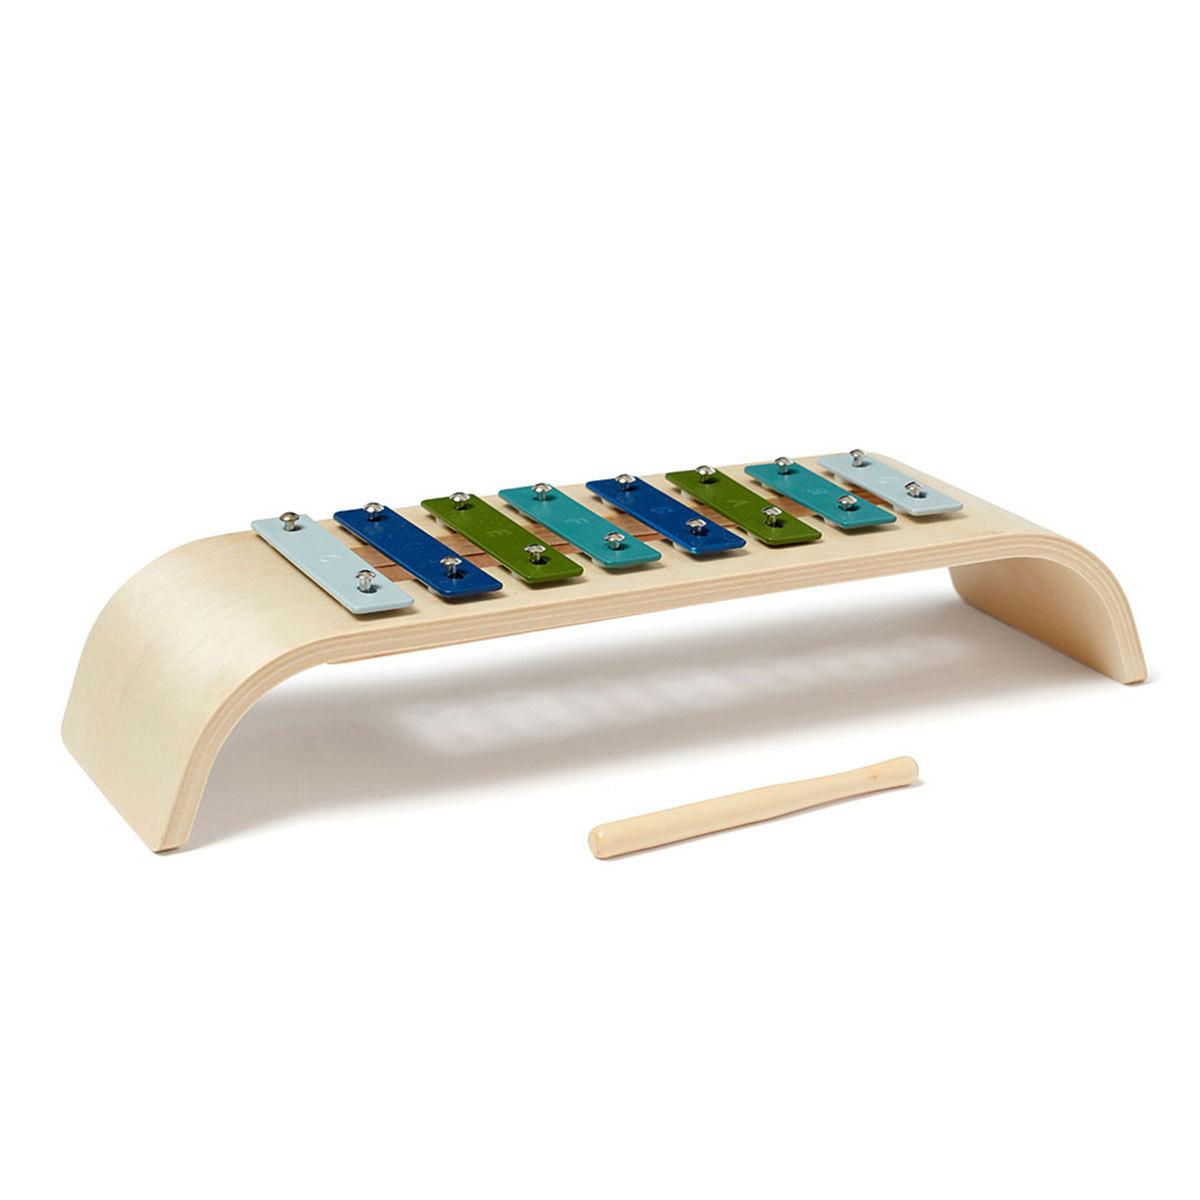 Mes premiers jouets Xylophone - Bleu Xylophone - Bleu